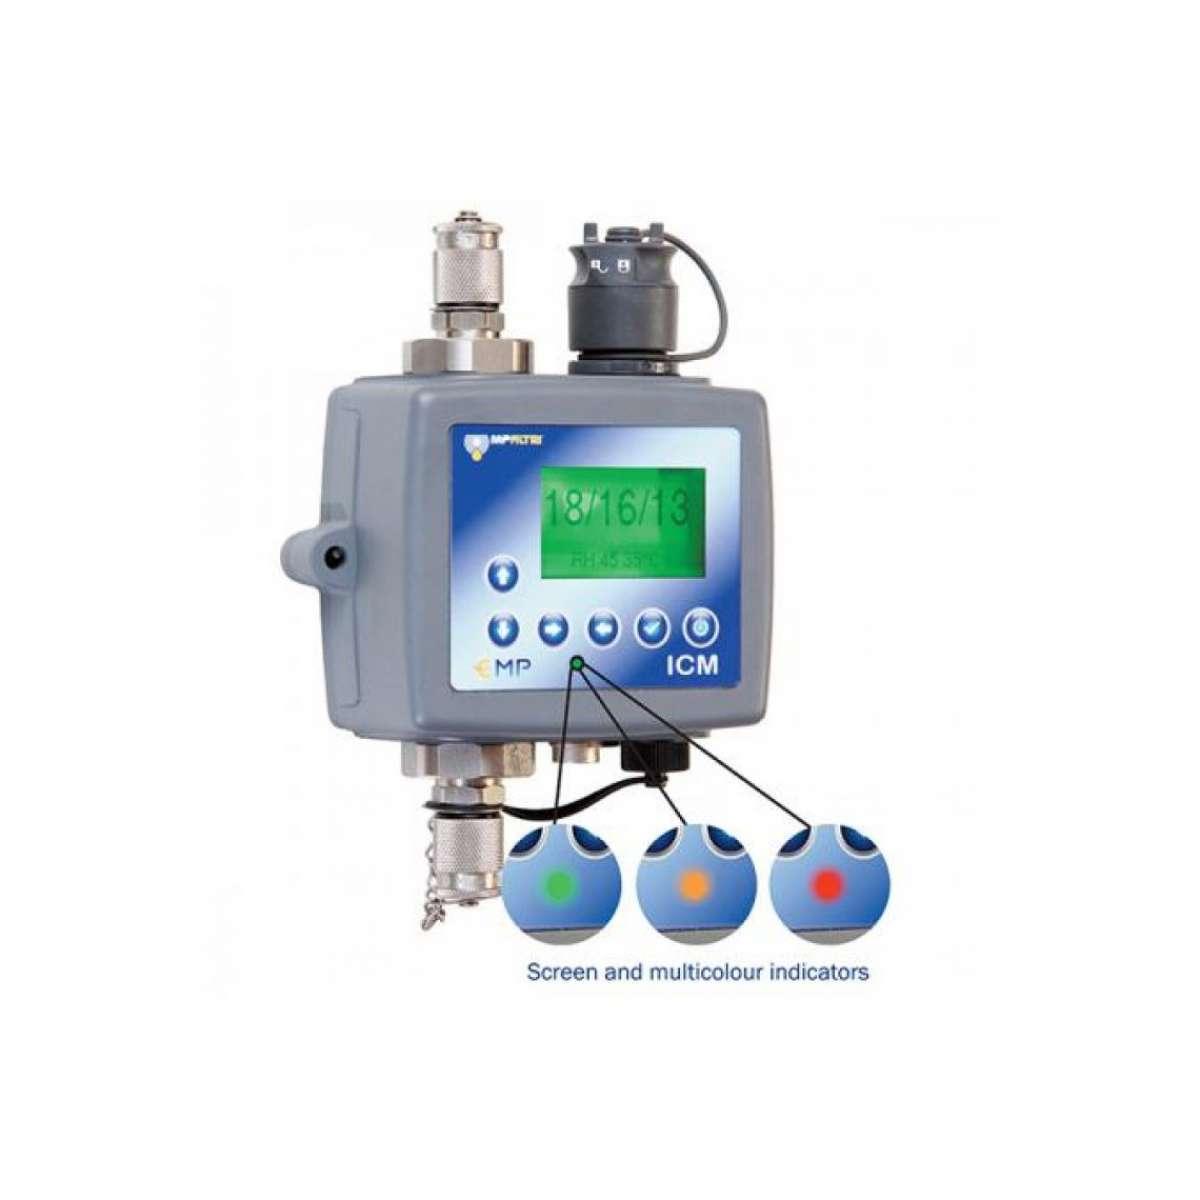 ICM In-line Contamination Monitor